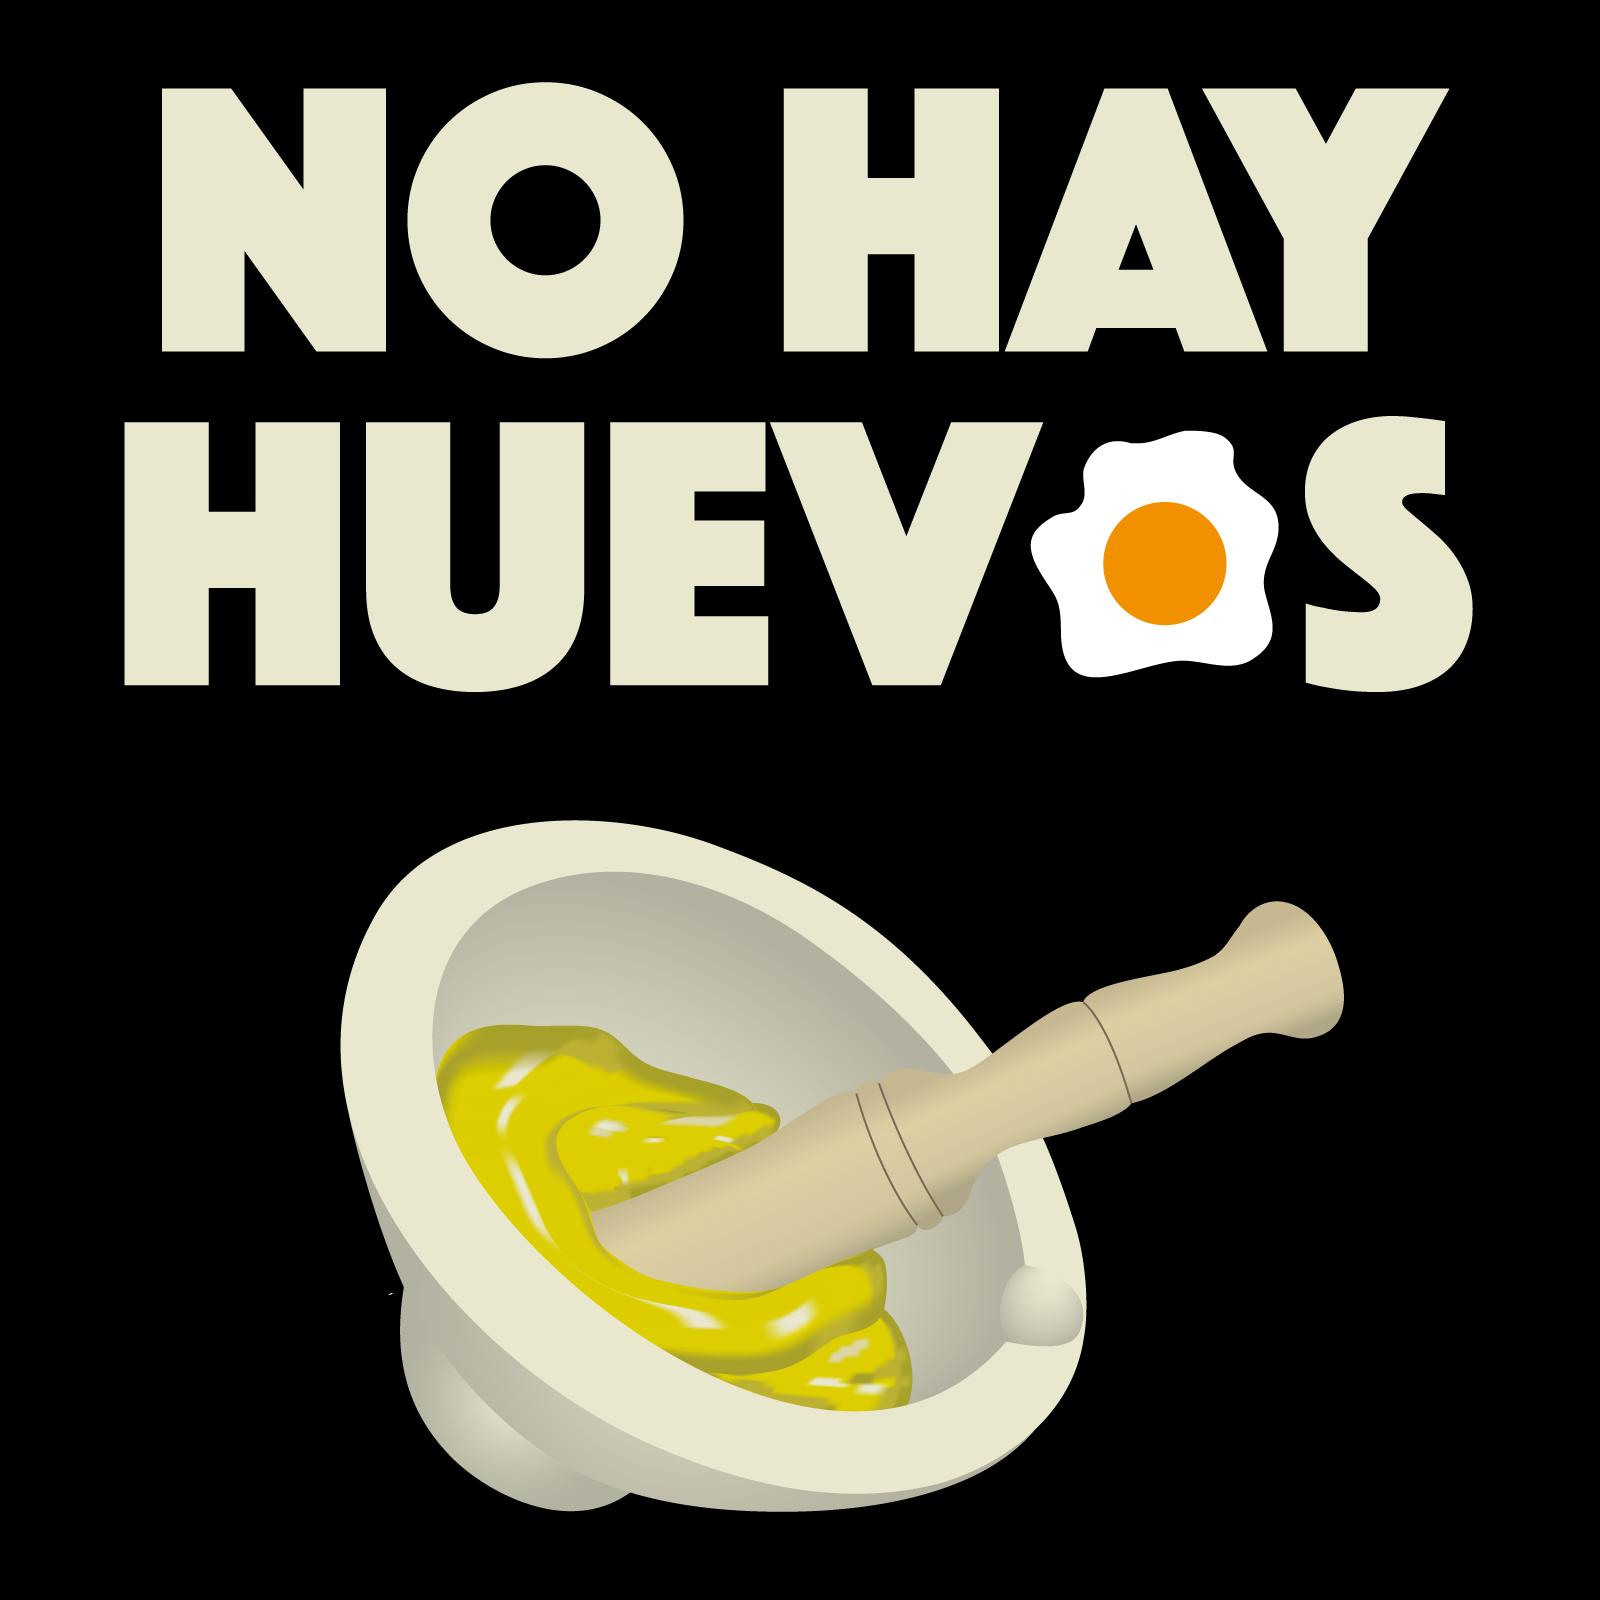 camiseta no hay huevos achavo camisetas